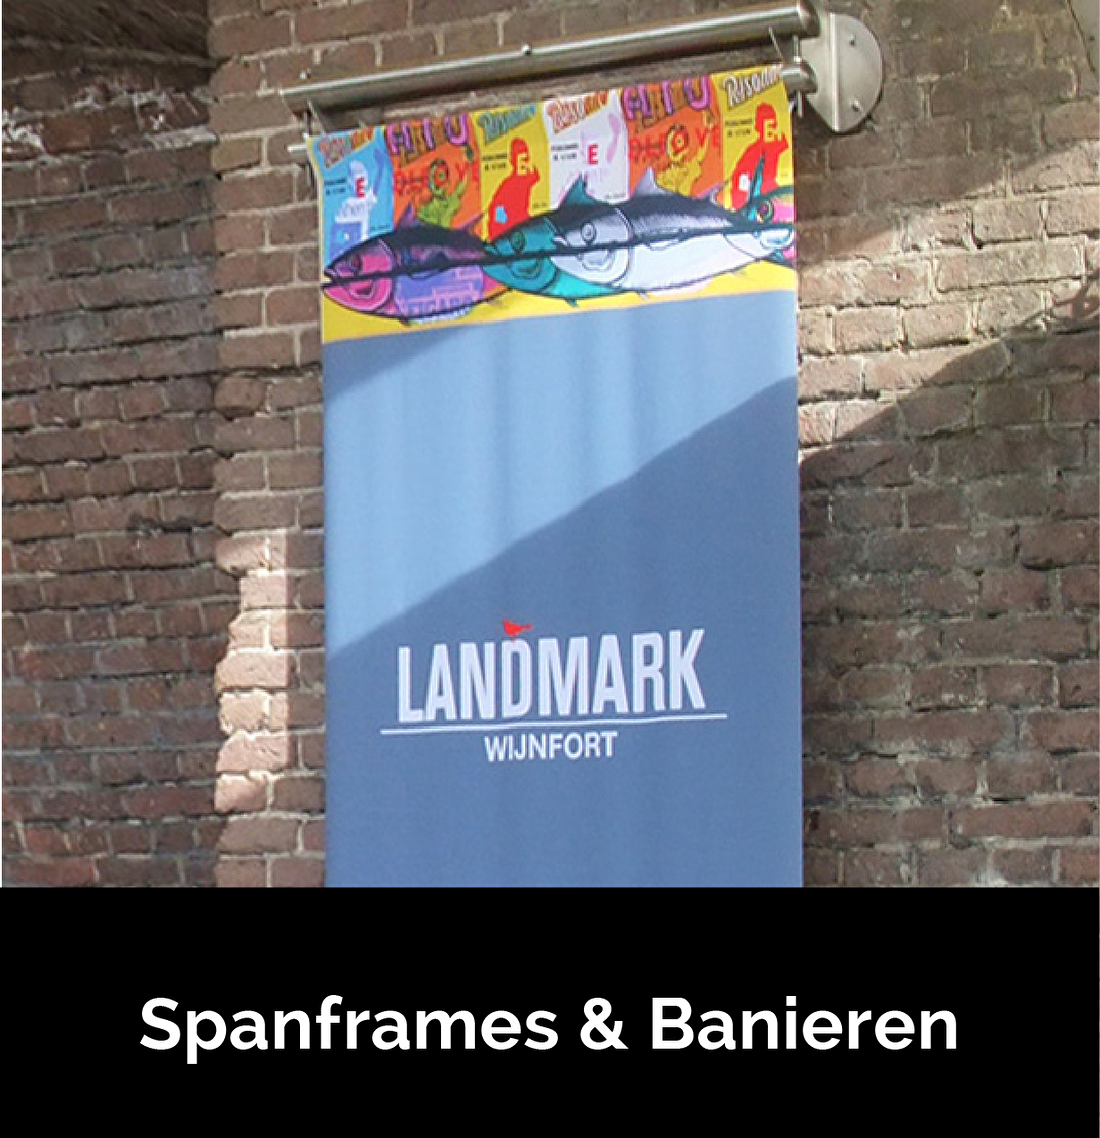 Spanframes & Banieren2.jpg